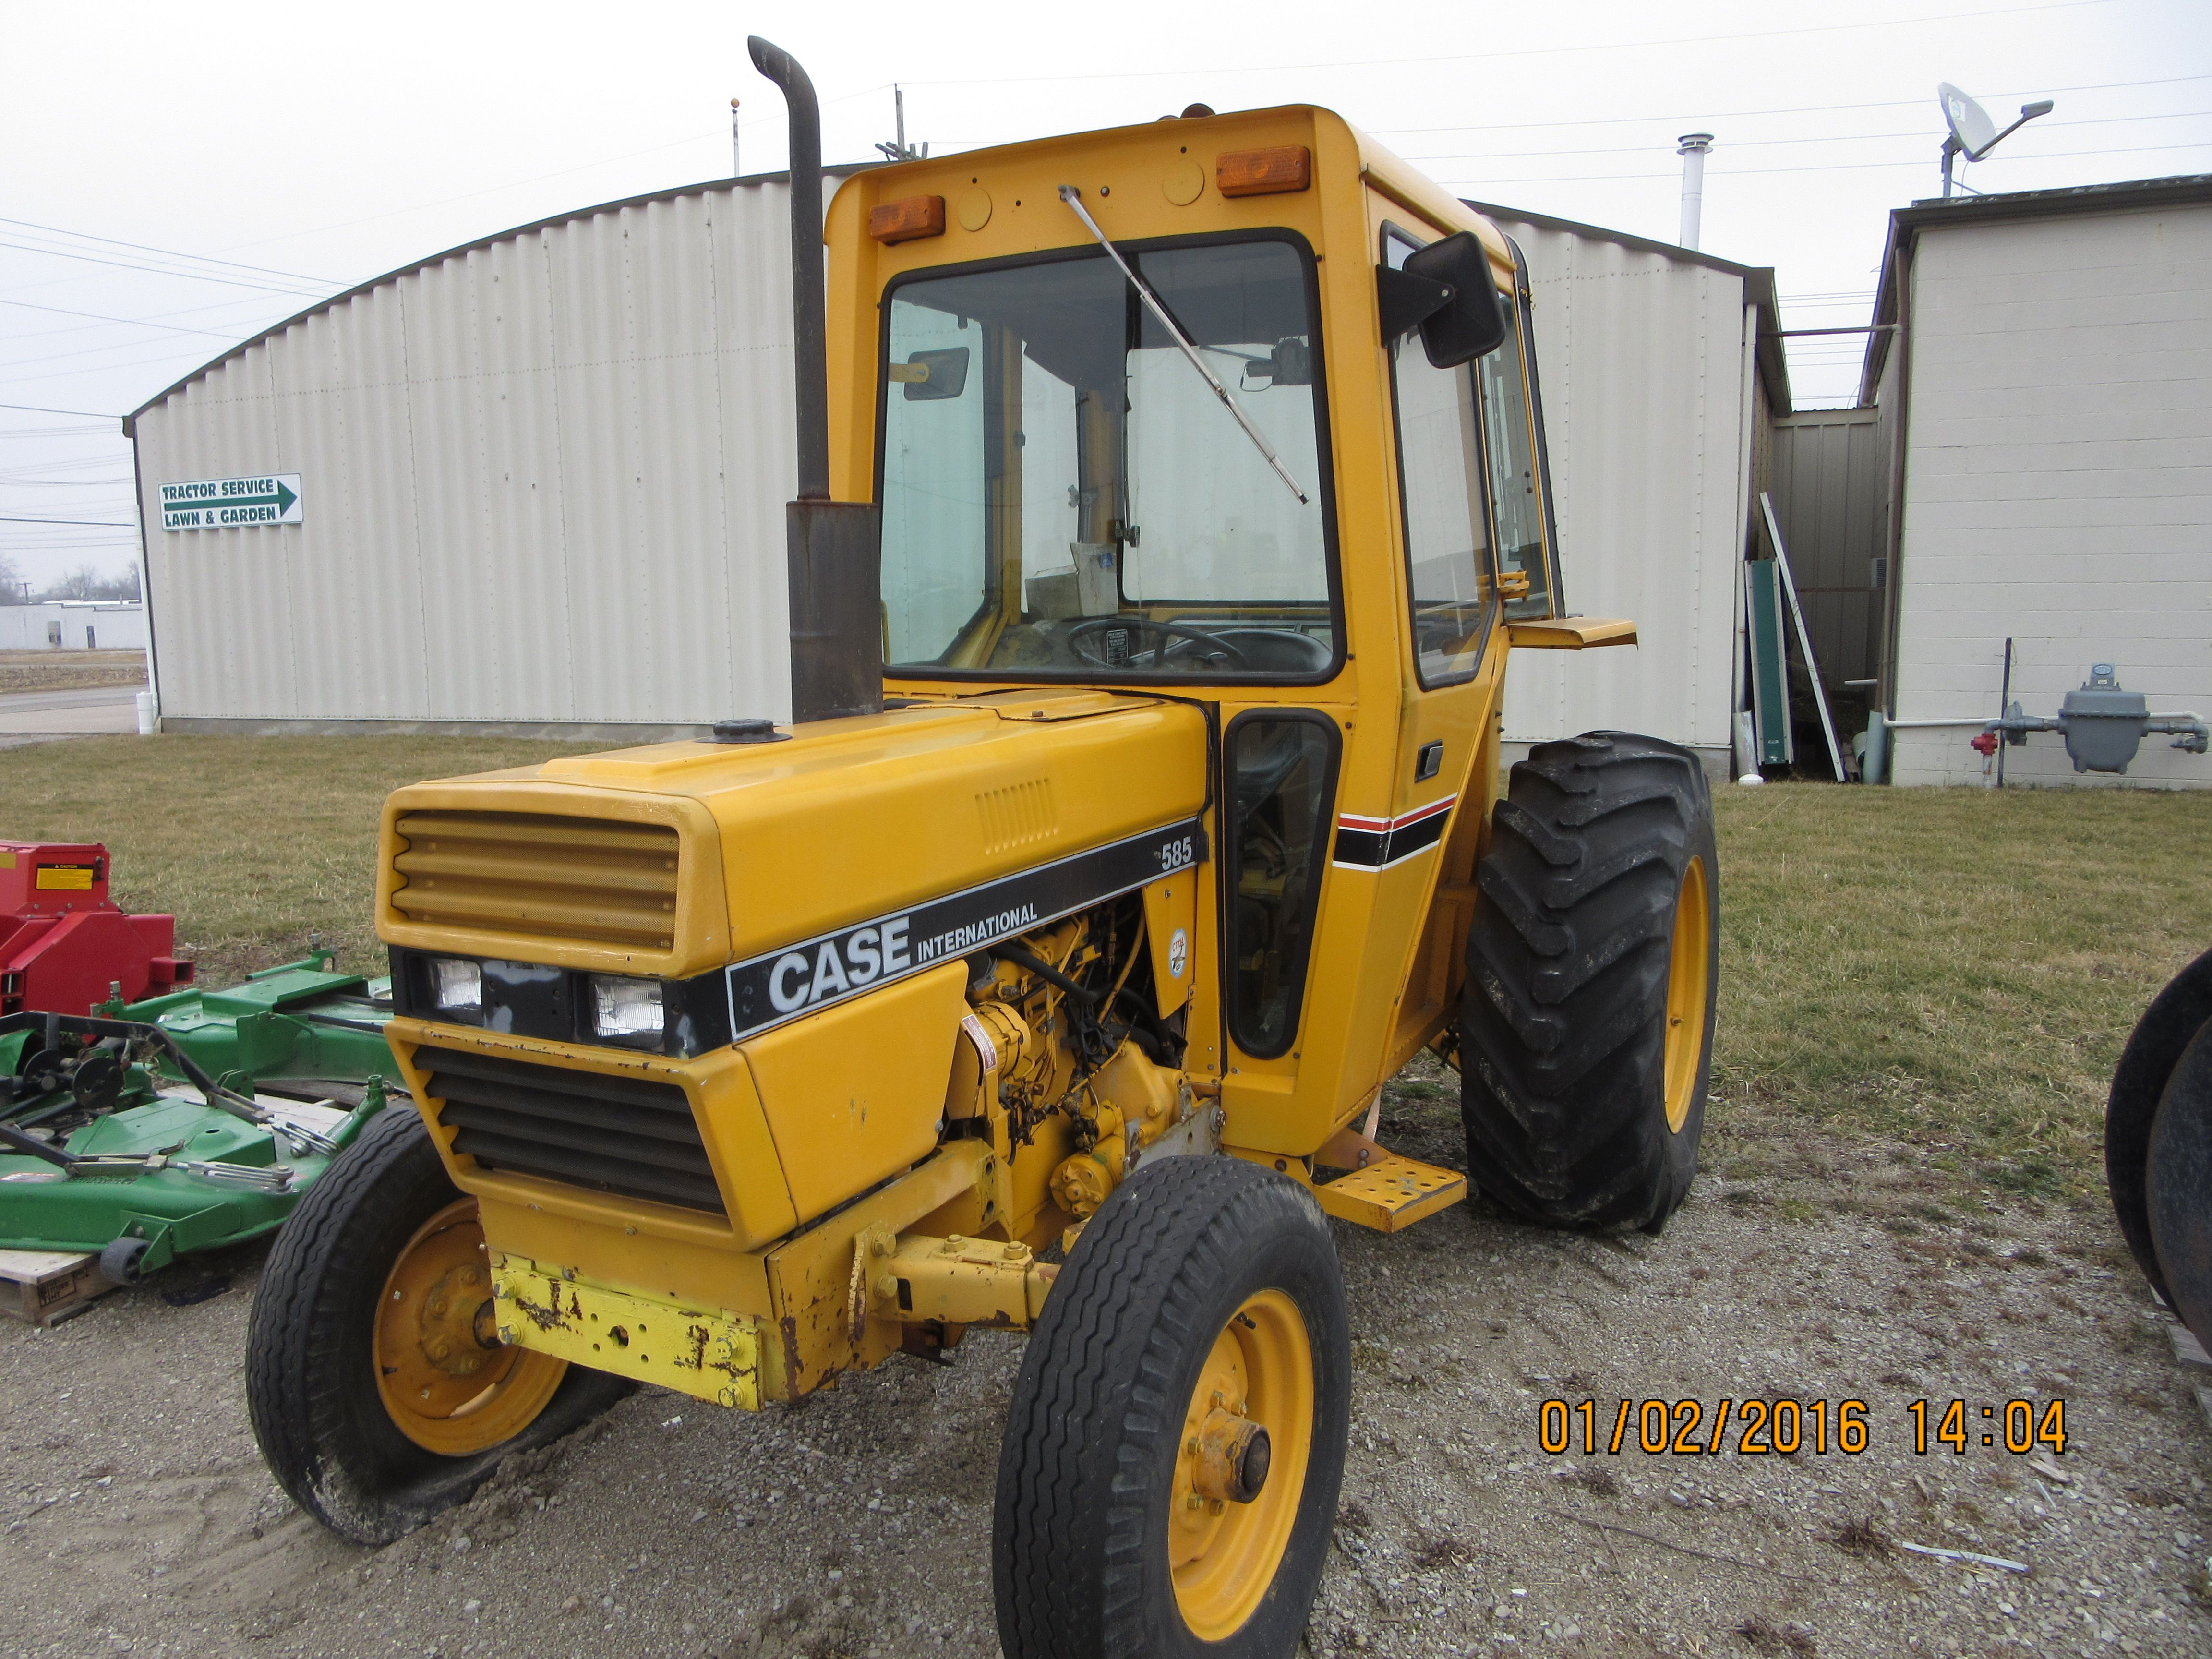 Admirable Yellow Case International 585 Cab Tractor Caseih Equipment Wiring Cloud Uslyletkolfr09Org